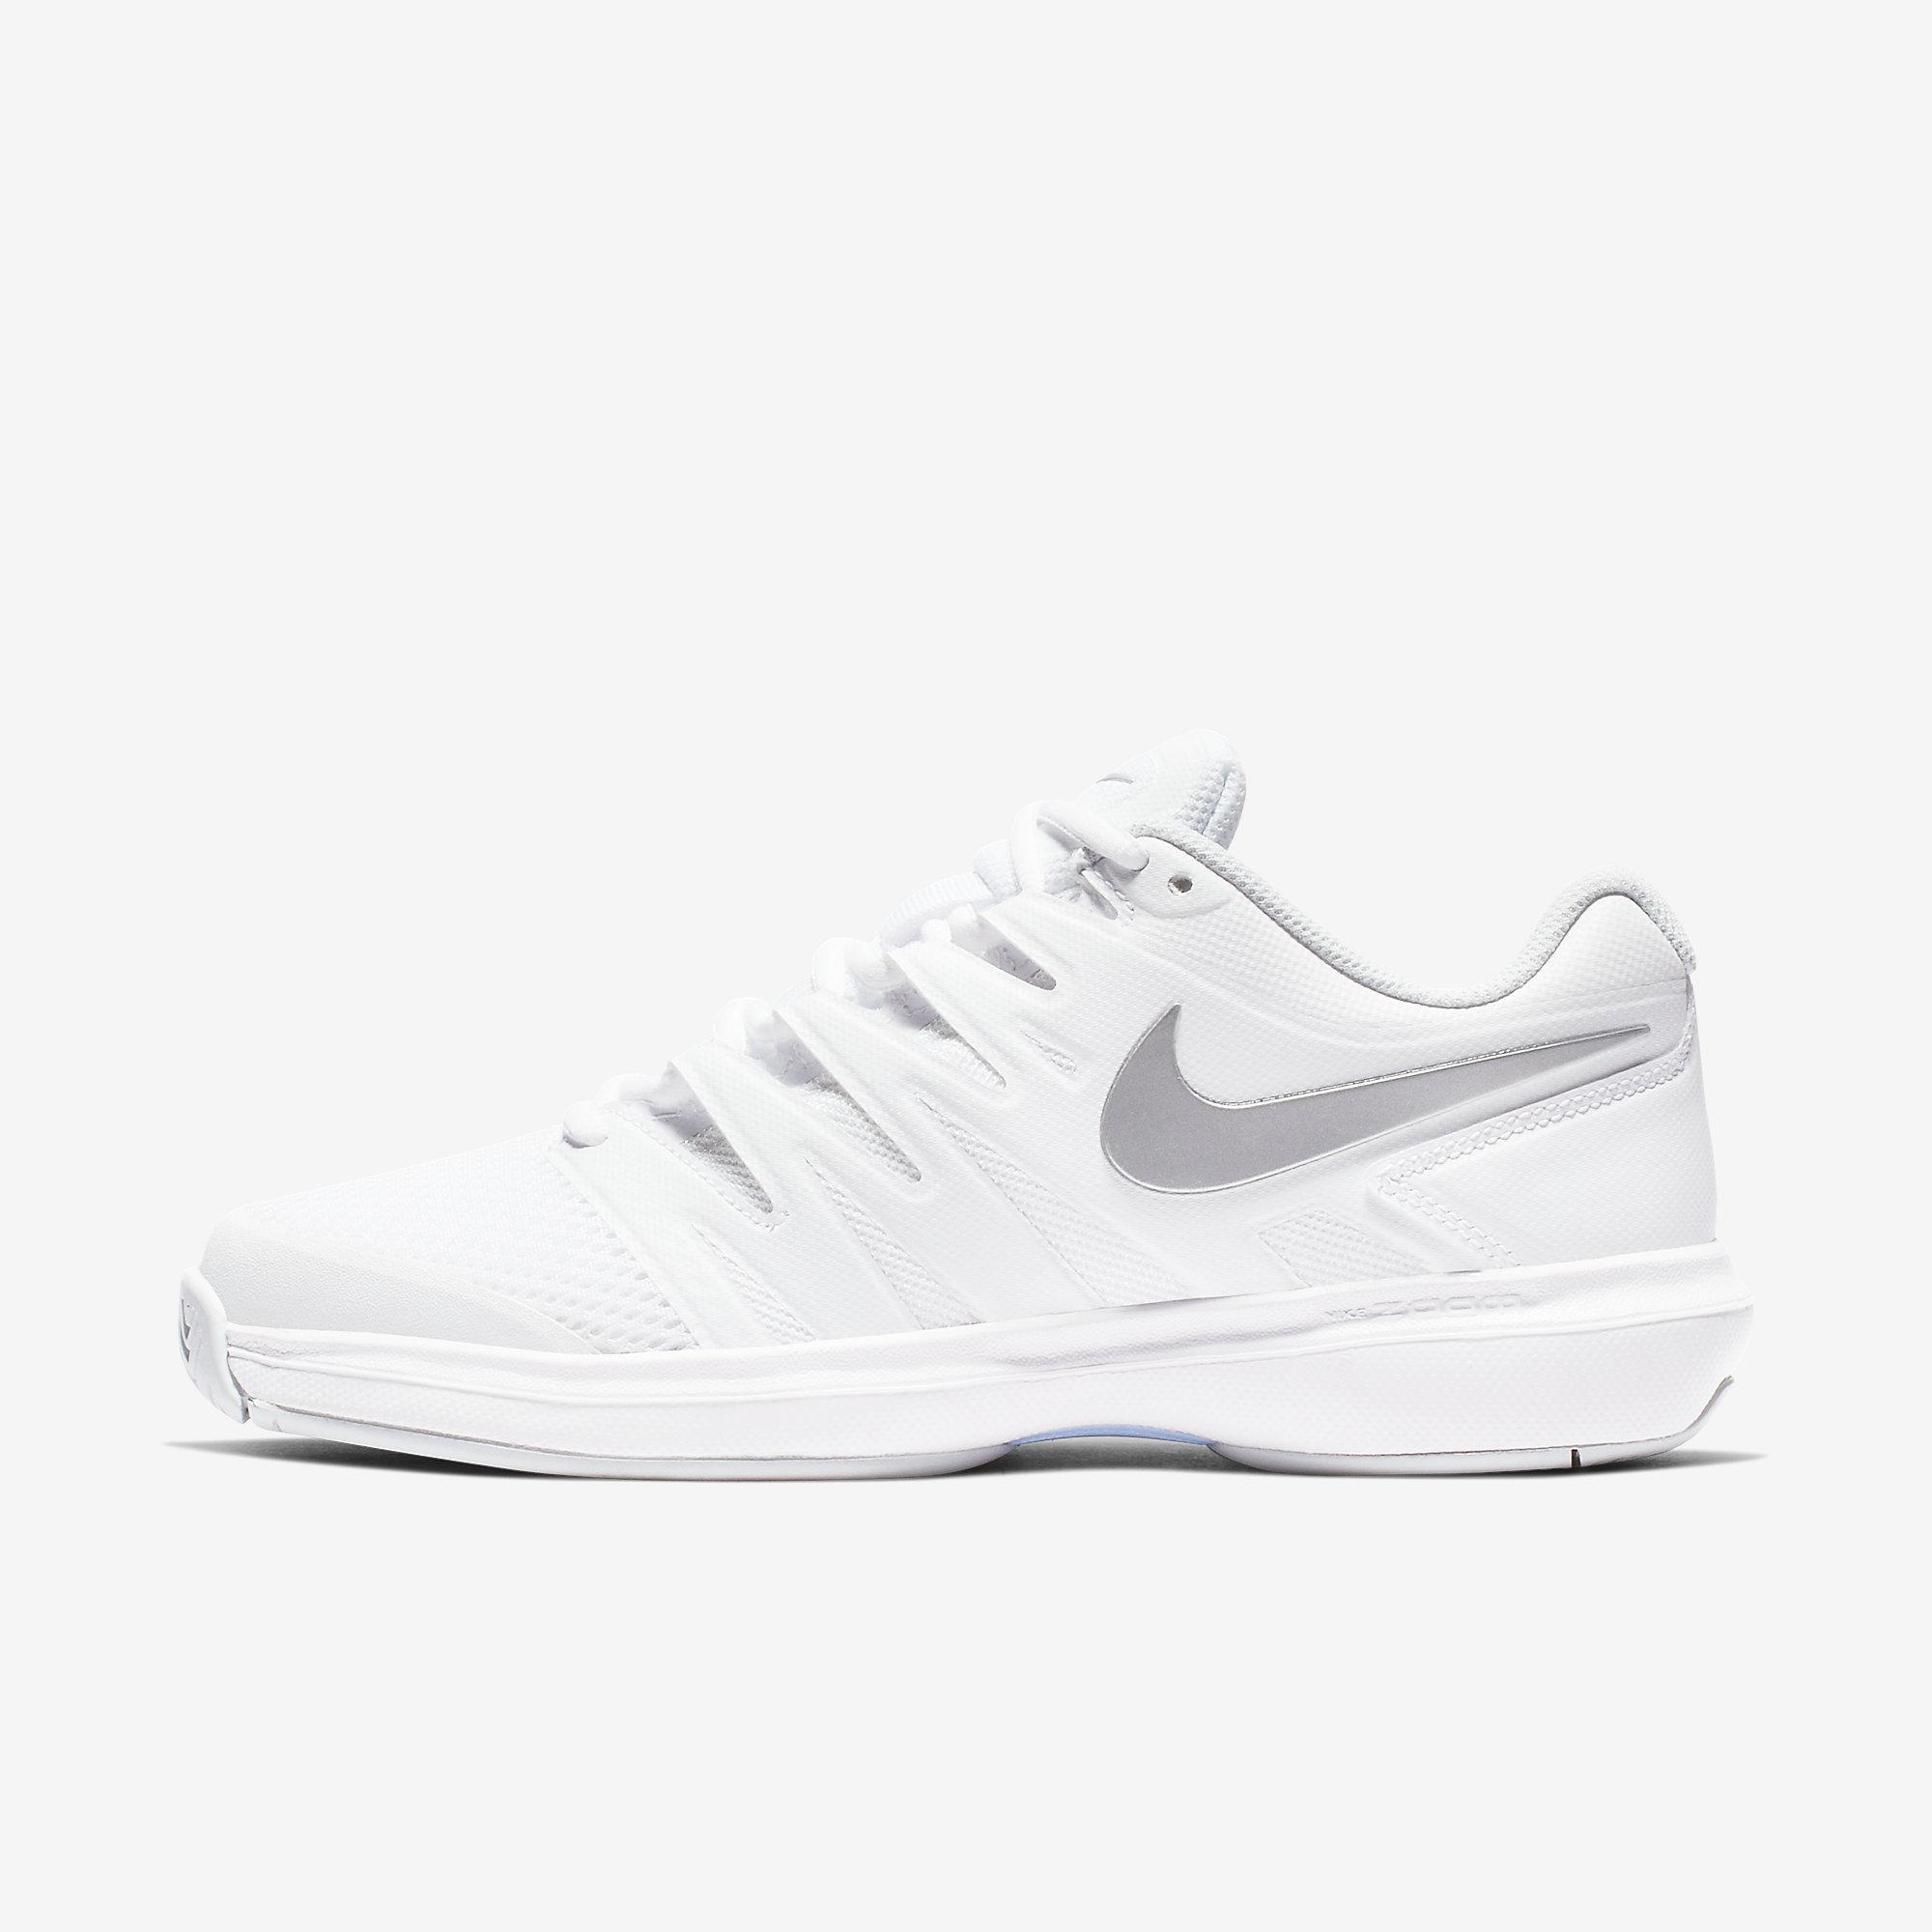 Nike Womens Air Zoom Prestige Tennis